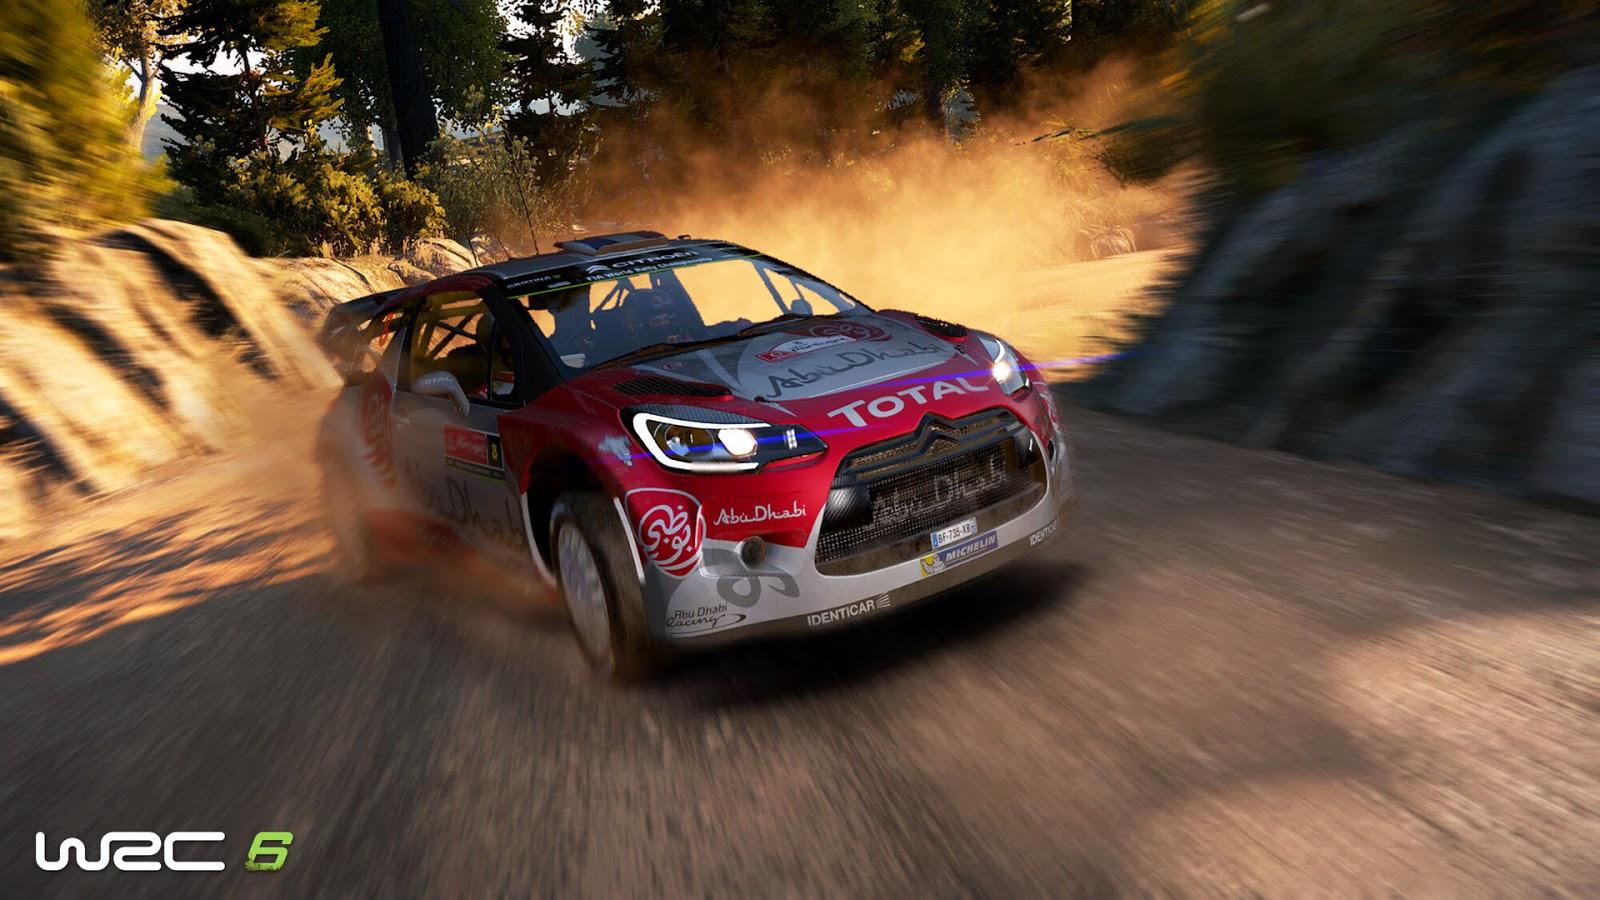 WRC 6 FIA World Rally Championship ESPAÑOL PC (STEAMPUNKS) + REPACK 4 DVD5 (JPW) 3